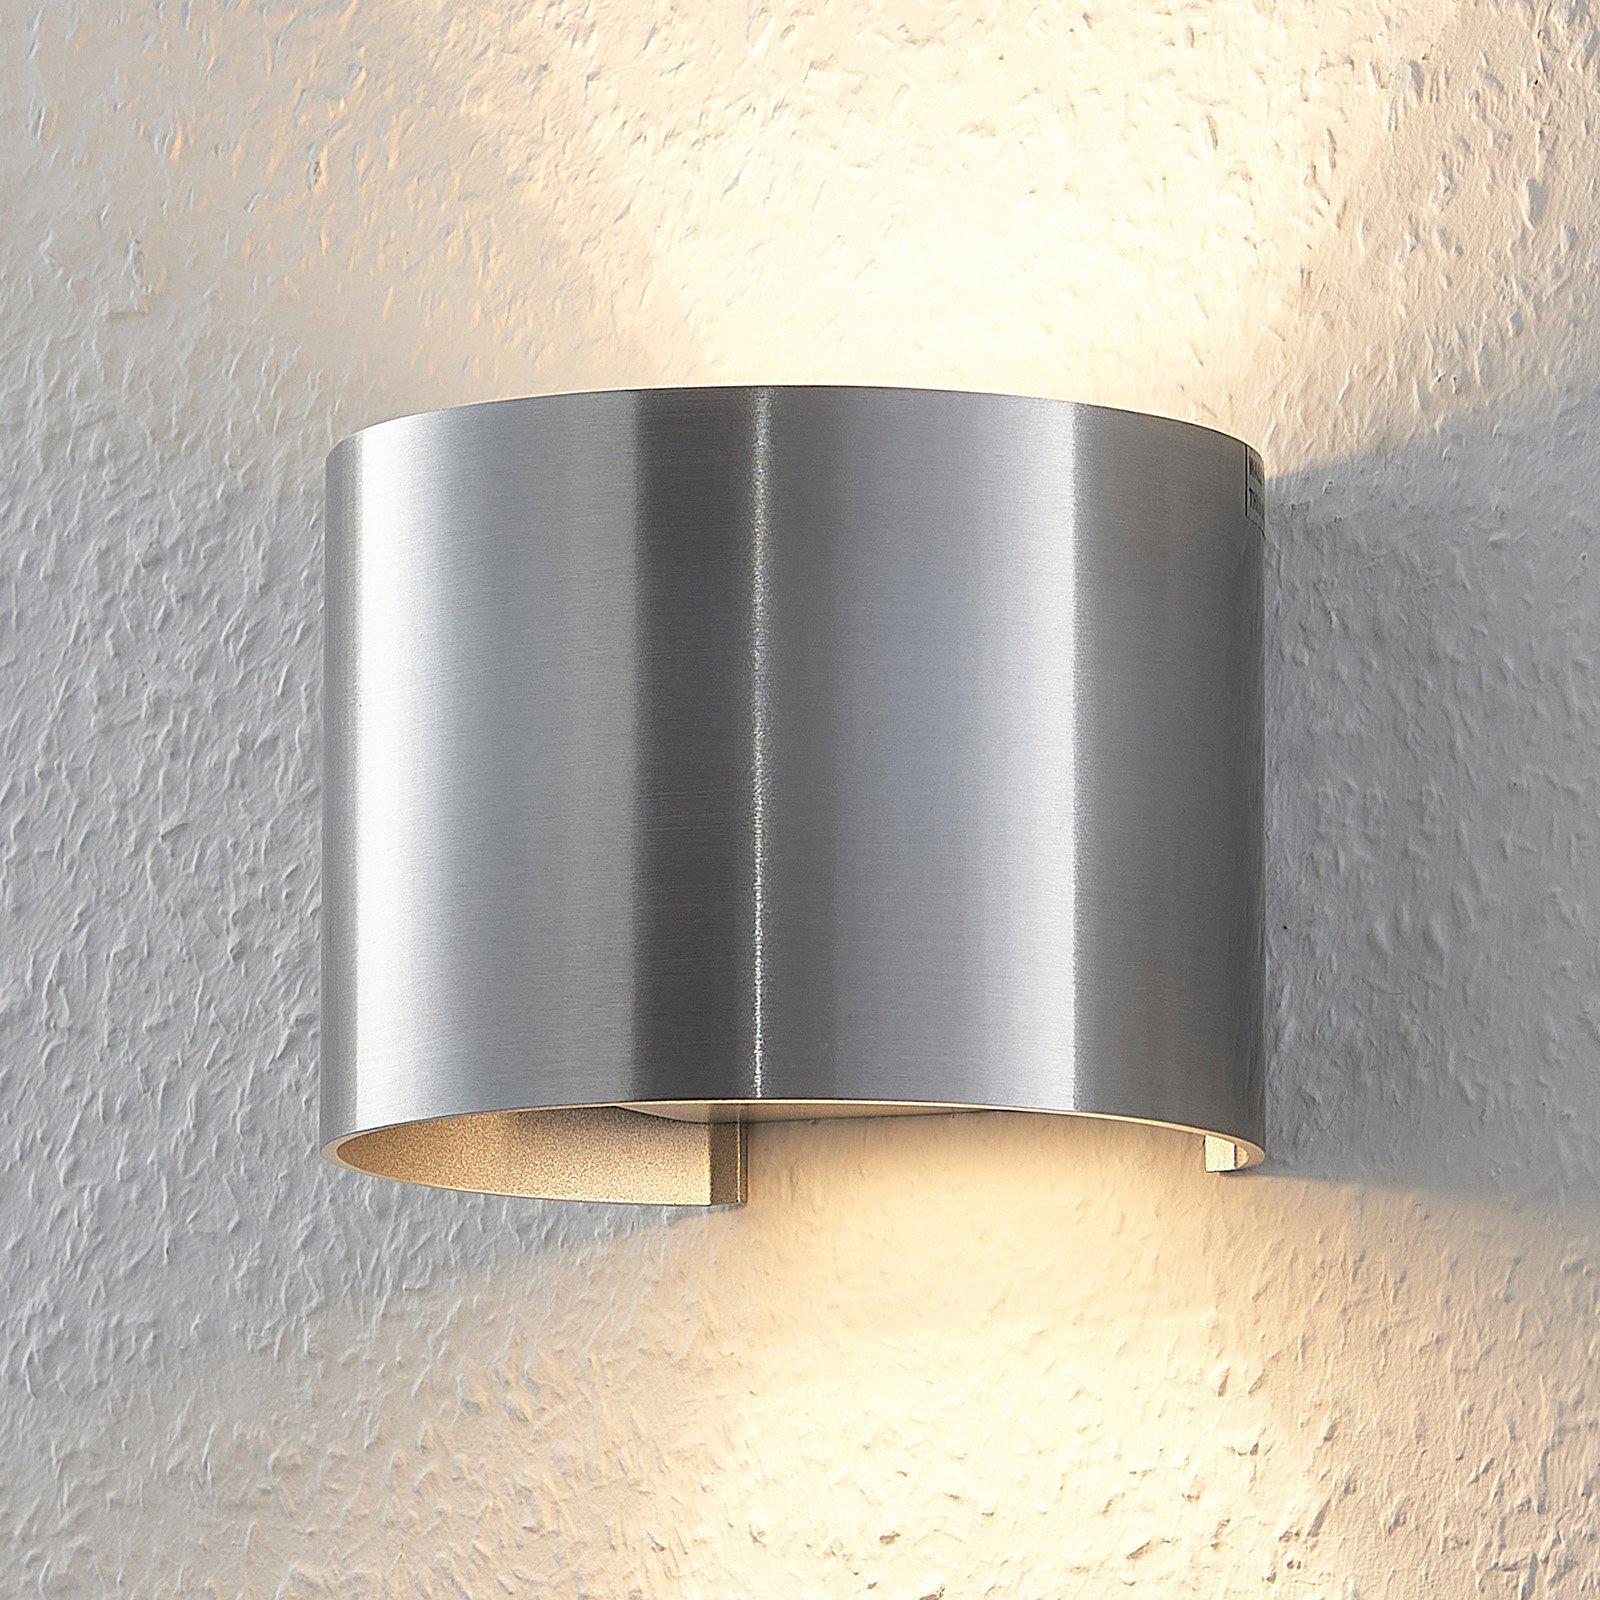 Aluminiumsfarget, rund LED-vegglampe Zuzana